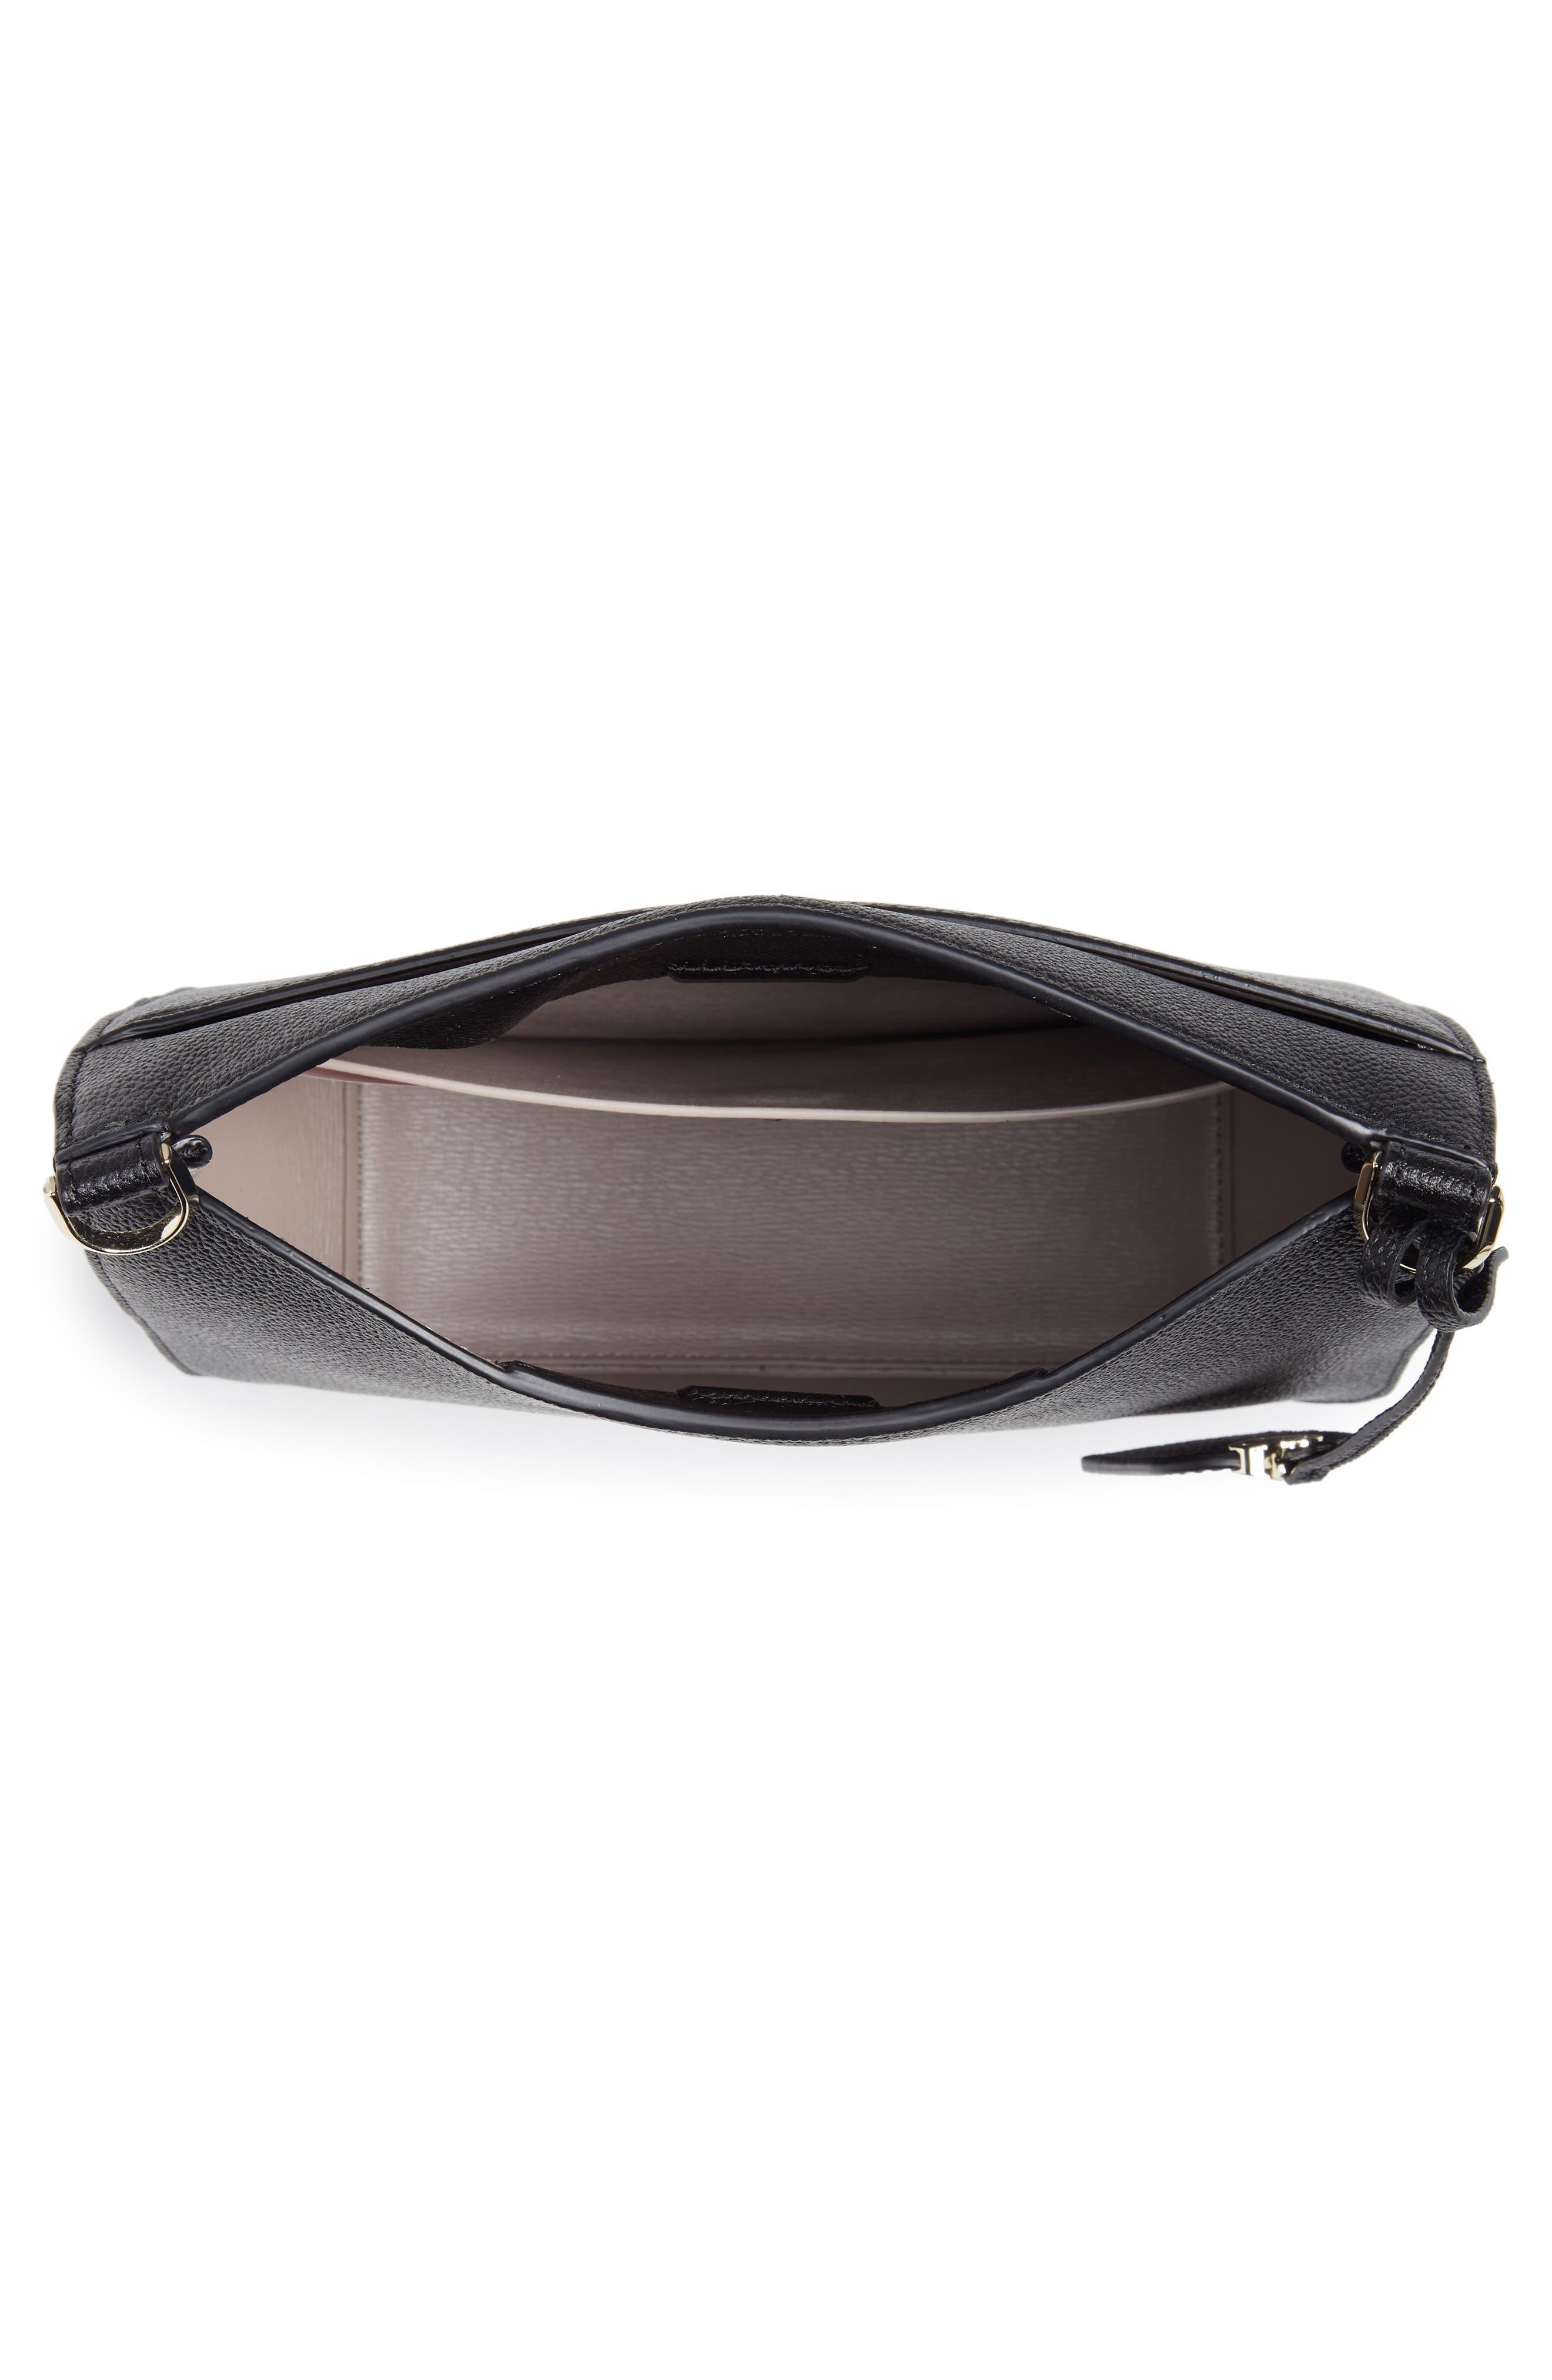 KATE SPADE NEW YORK,                             margaux large crossbody bag,                             Alternate thumbnail 4, color,                             BLACK